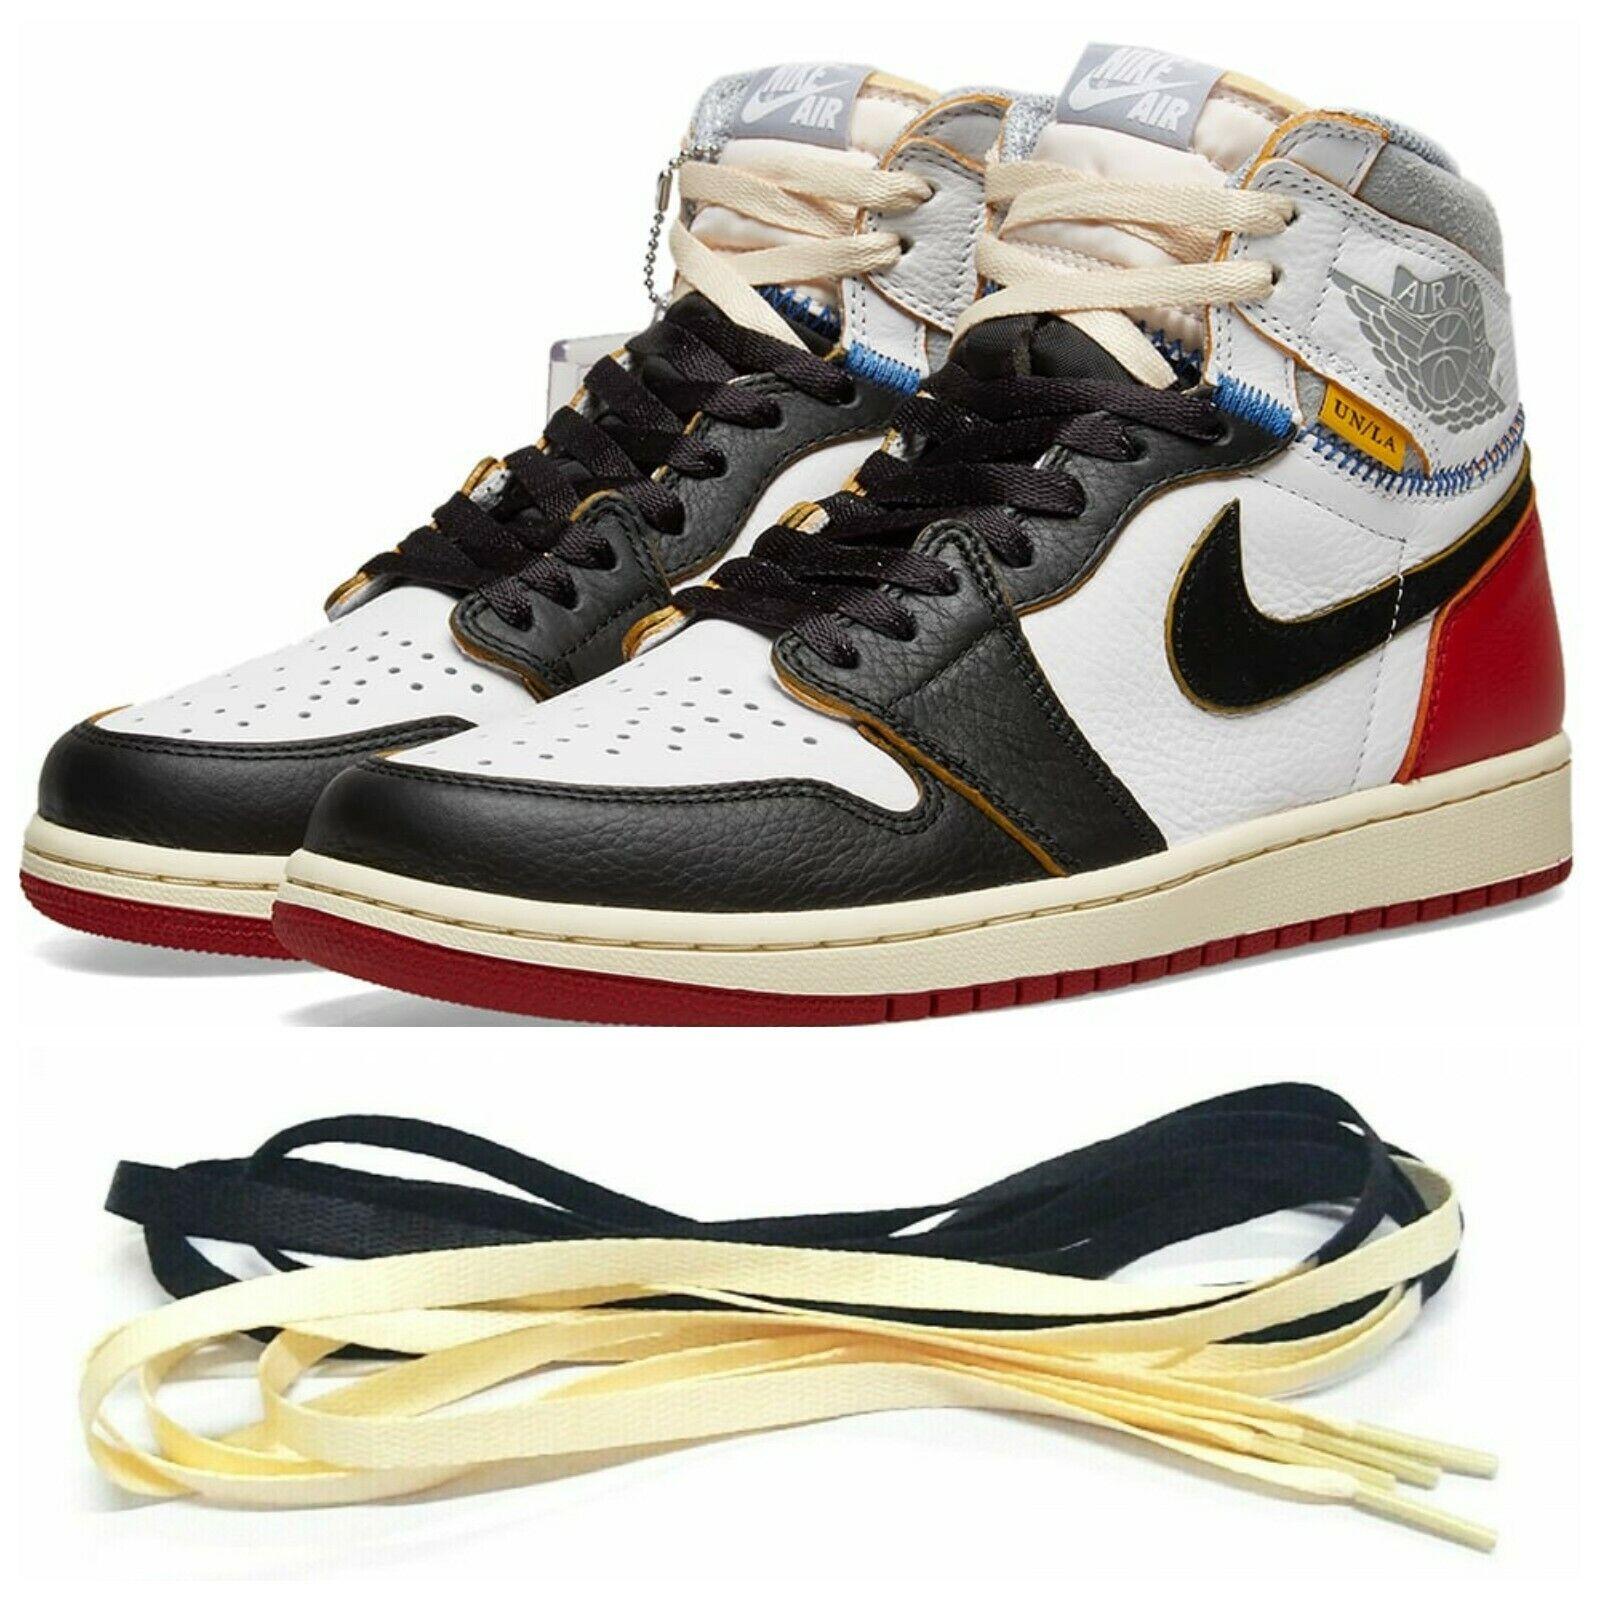 2 Tone Flat Laces For Air Jordan 1